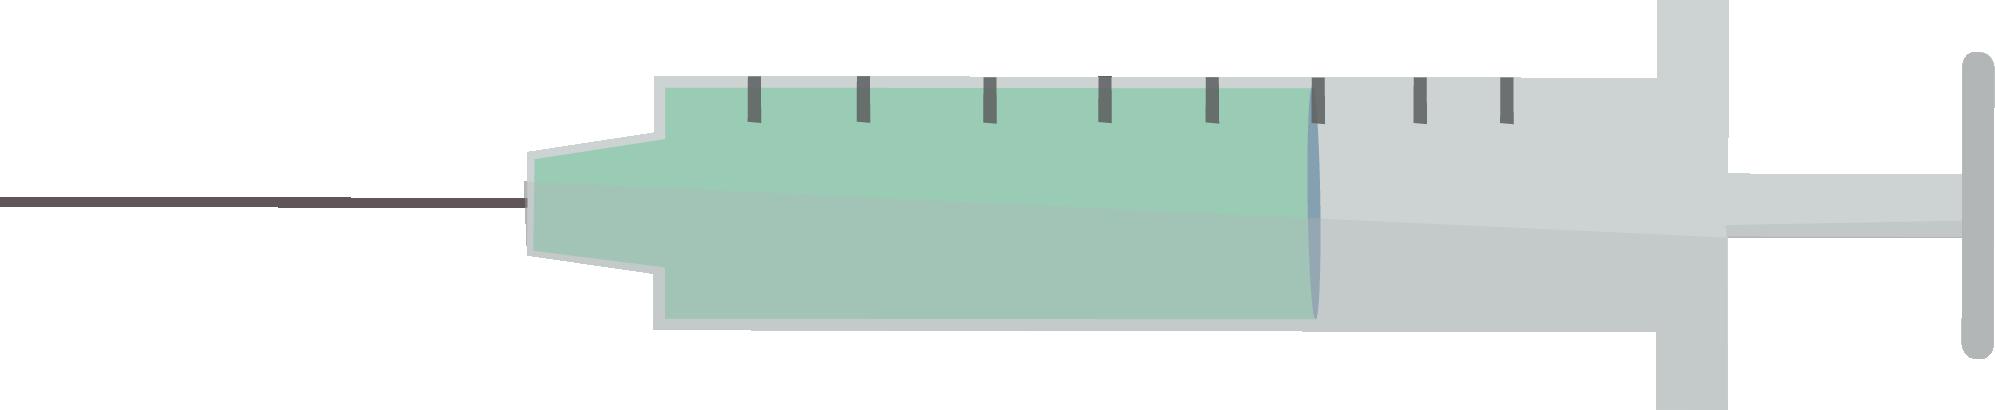 A vaccine syringe